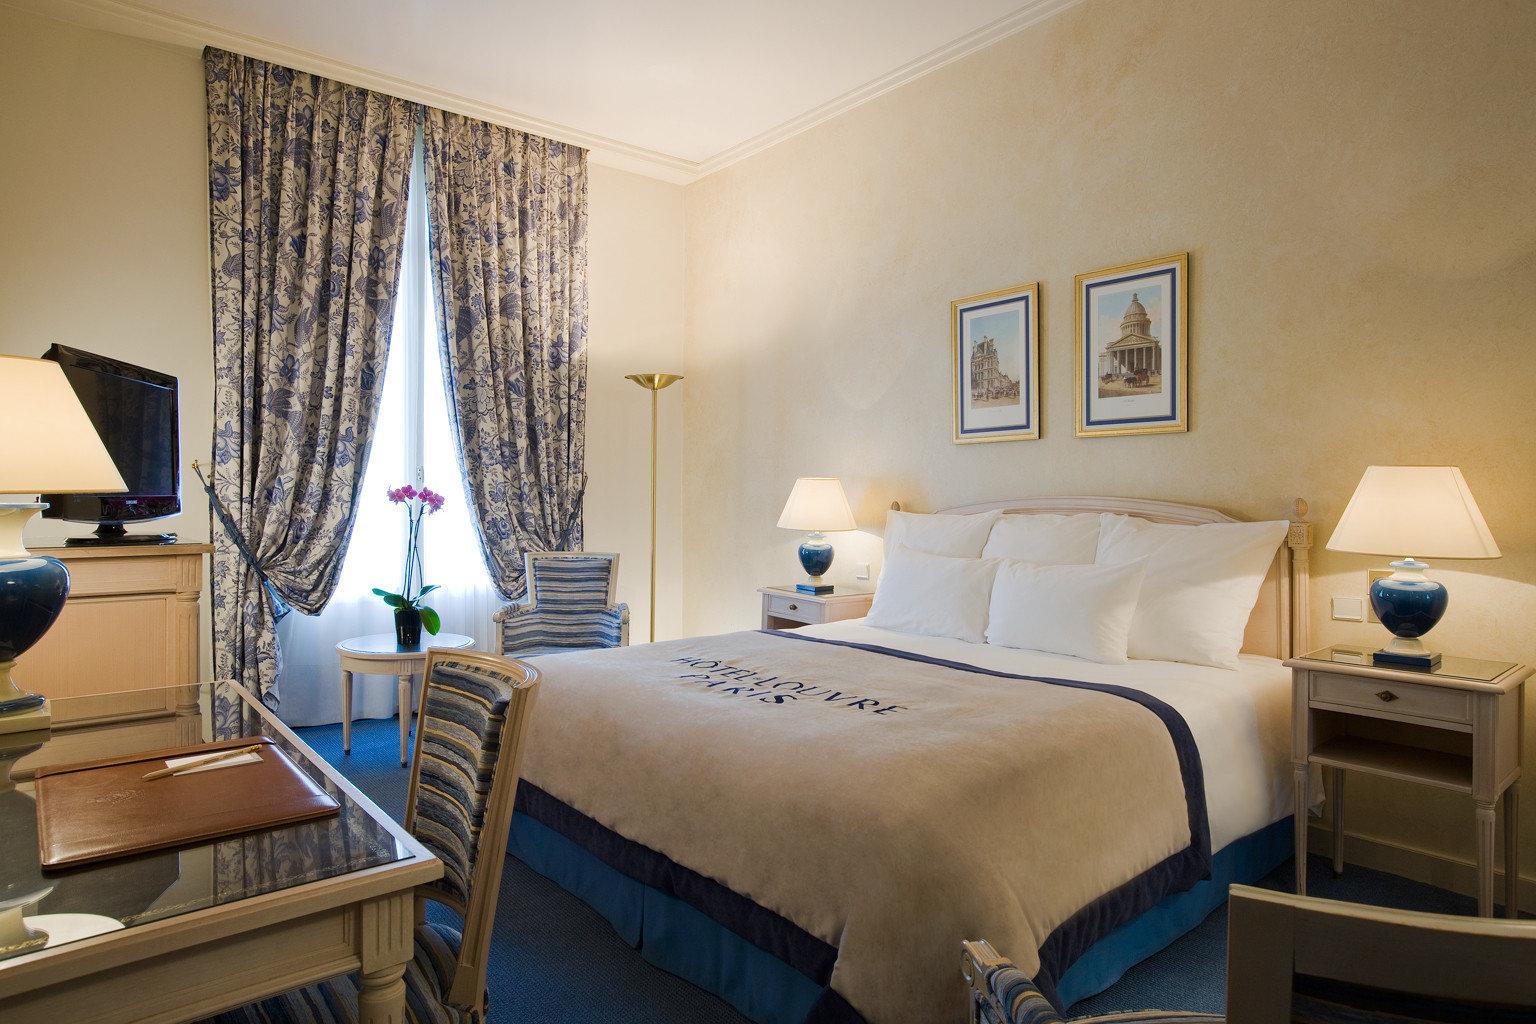 Bedroom Elegant Luxury Modern Suite property cottage home lamp